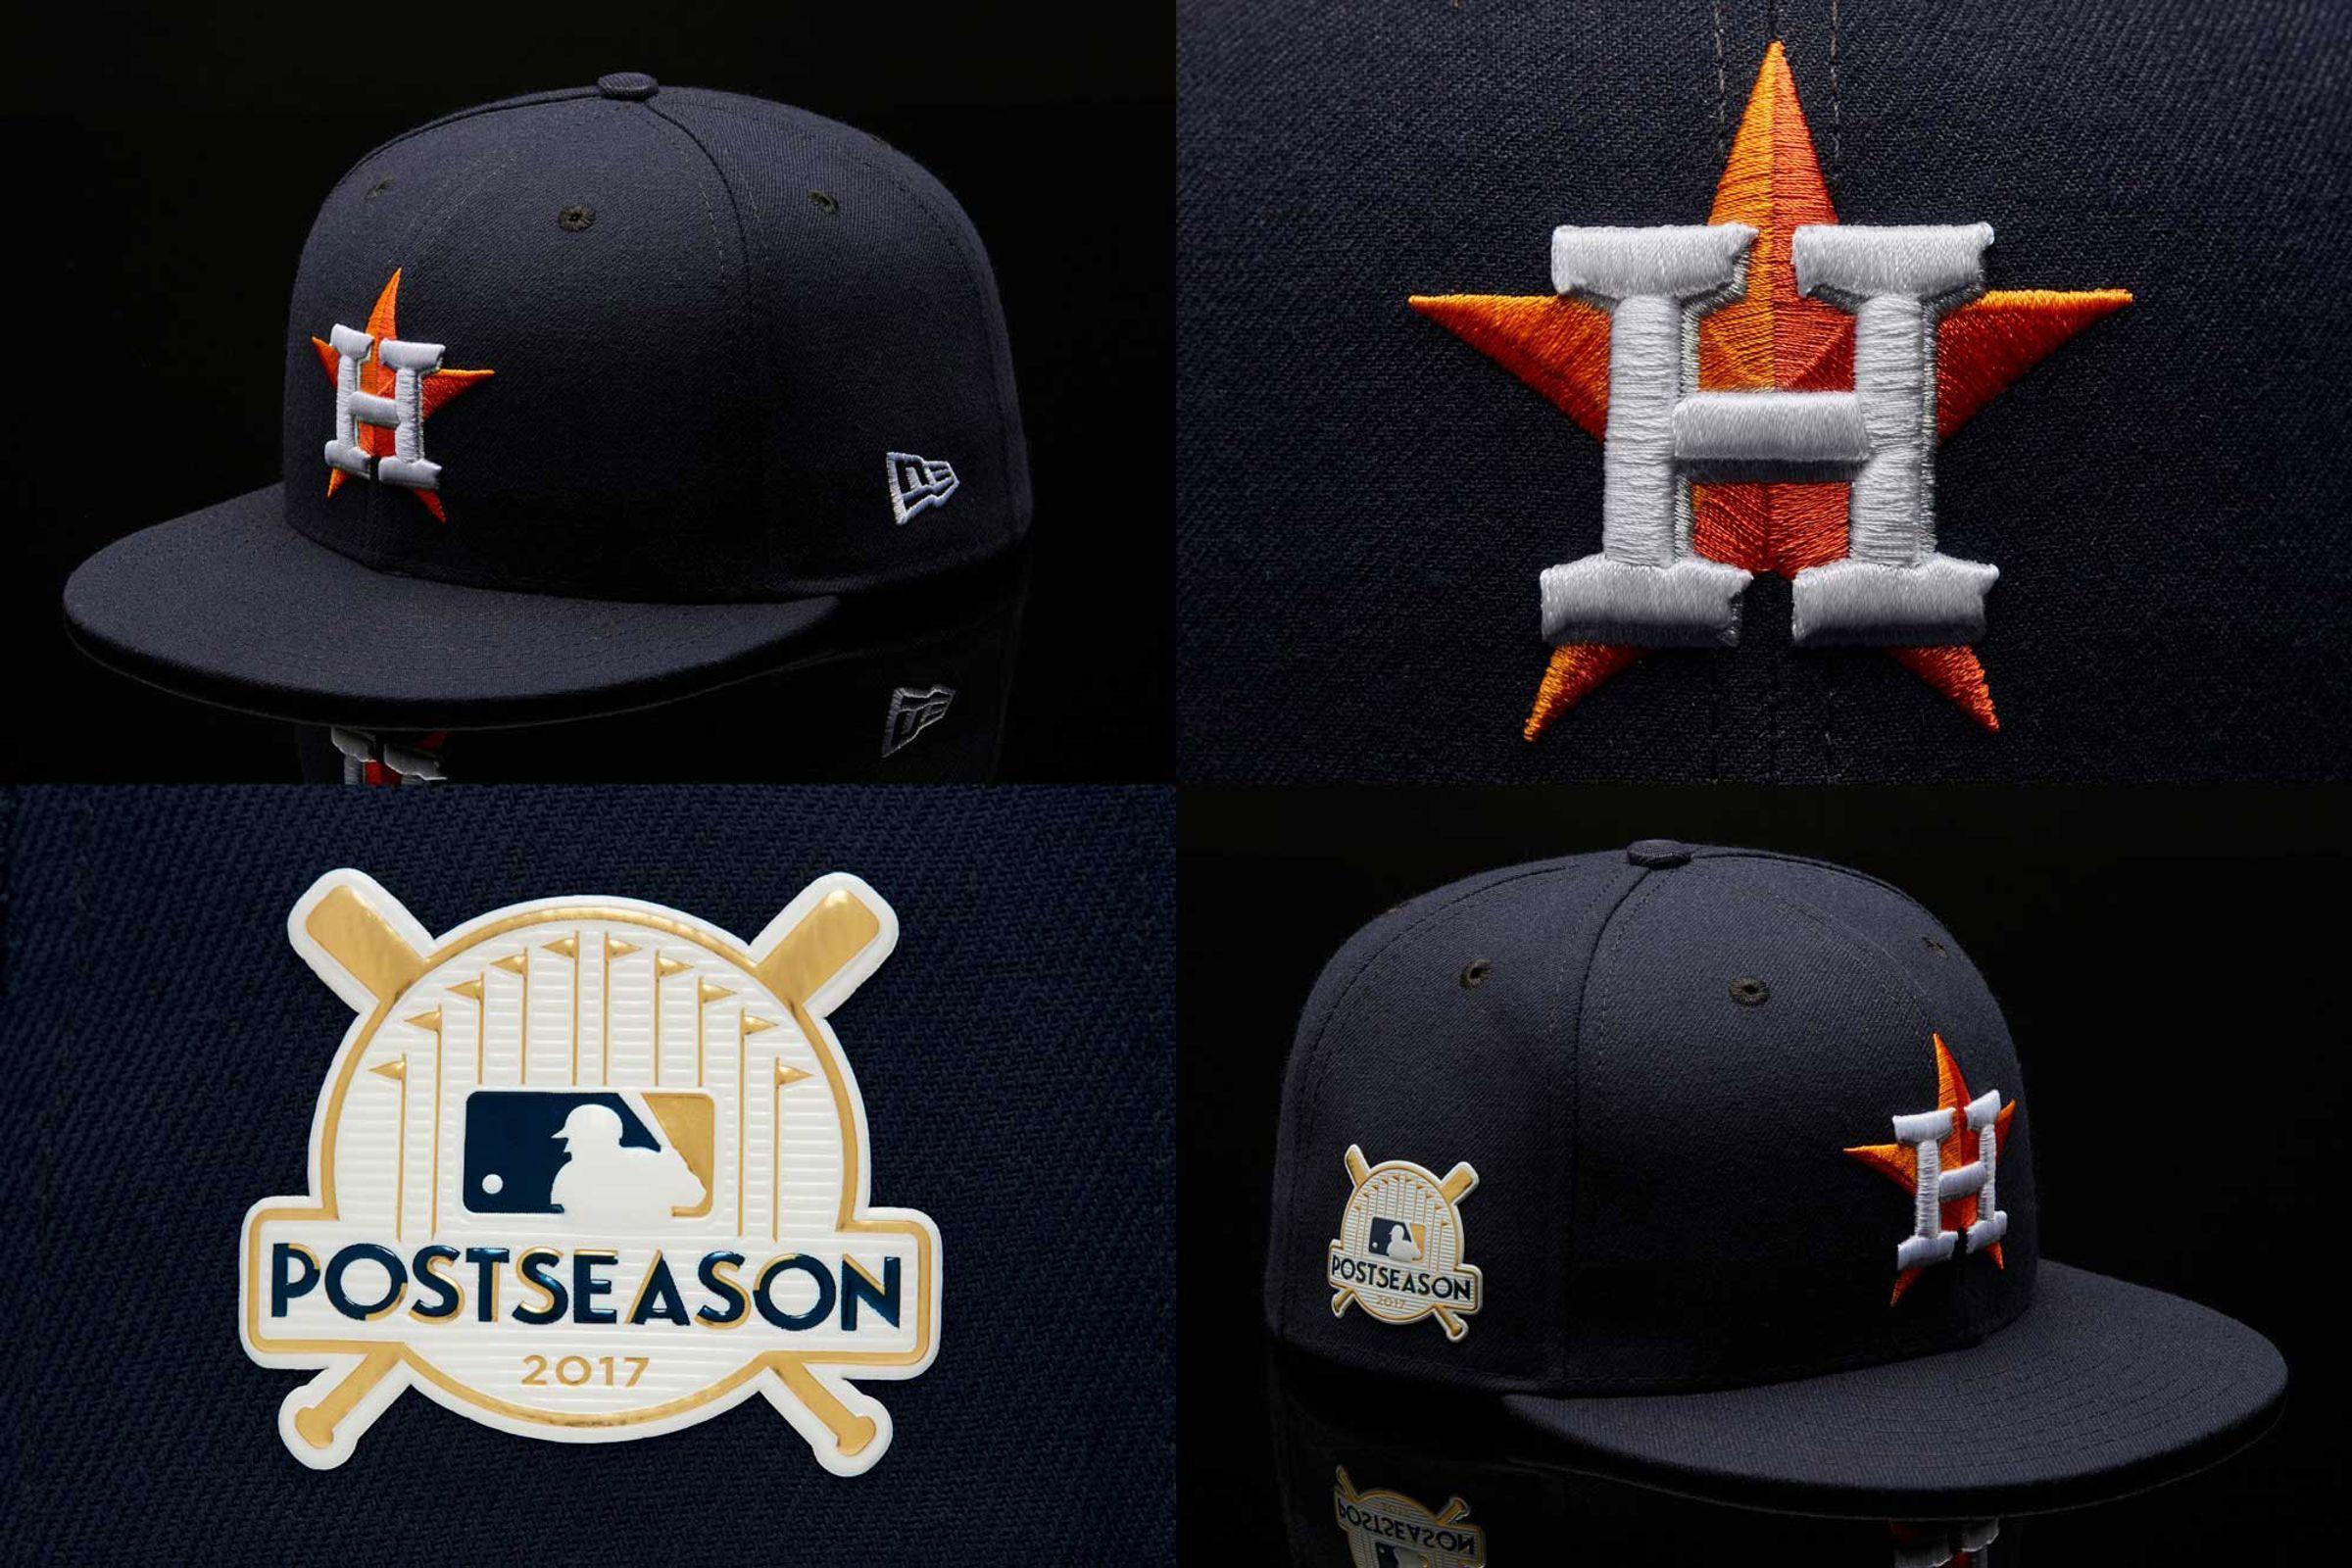 Mlb New Era Cap Us Mlb Baseball Caps Mlb New Era Cap